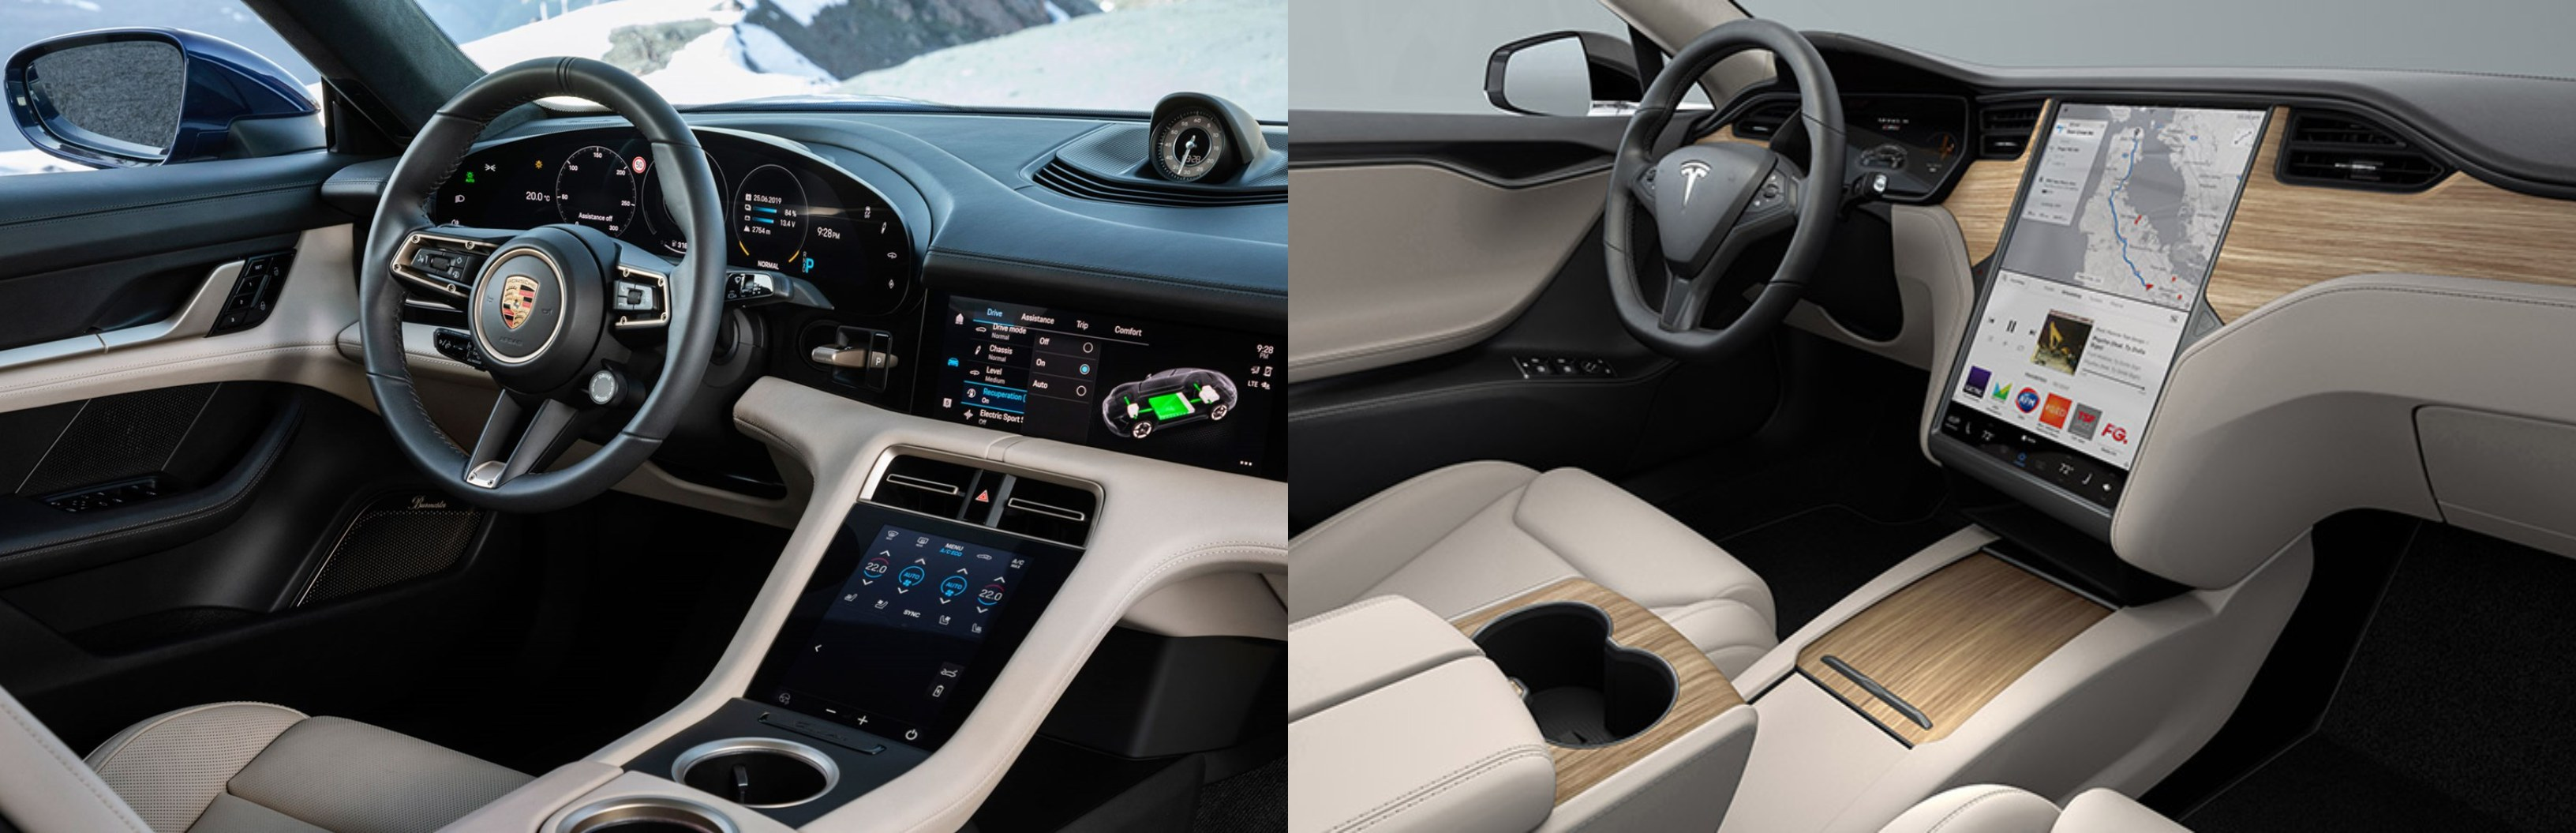 Tesla Model S Performance vs Porsche Taycan Turbo